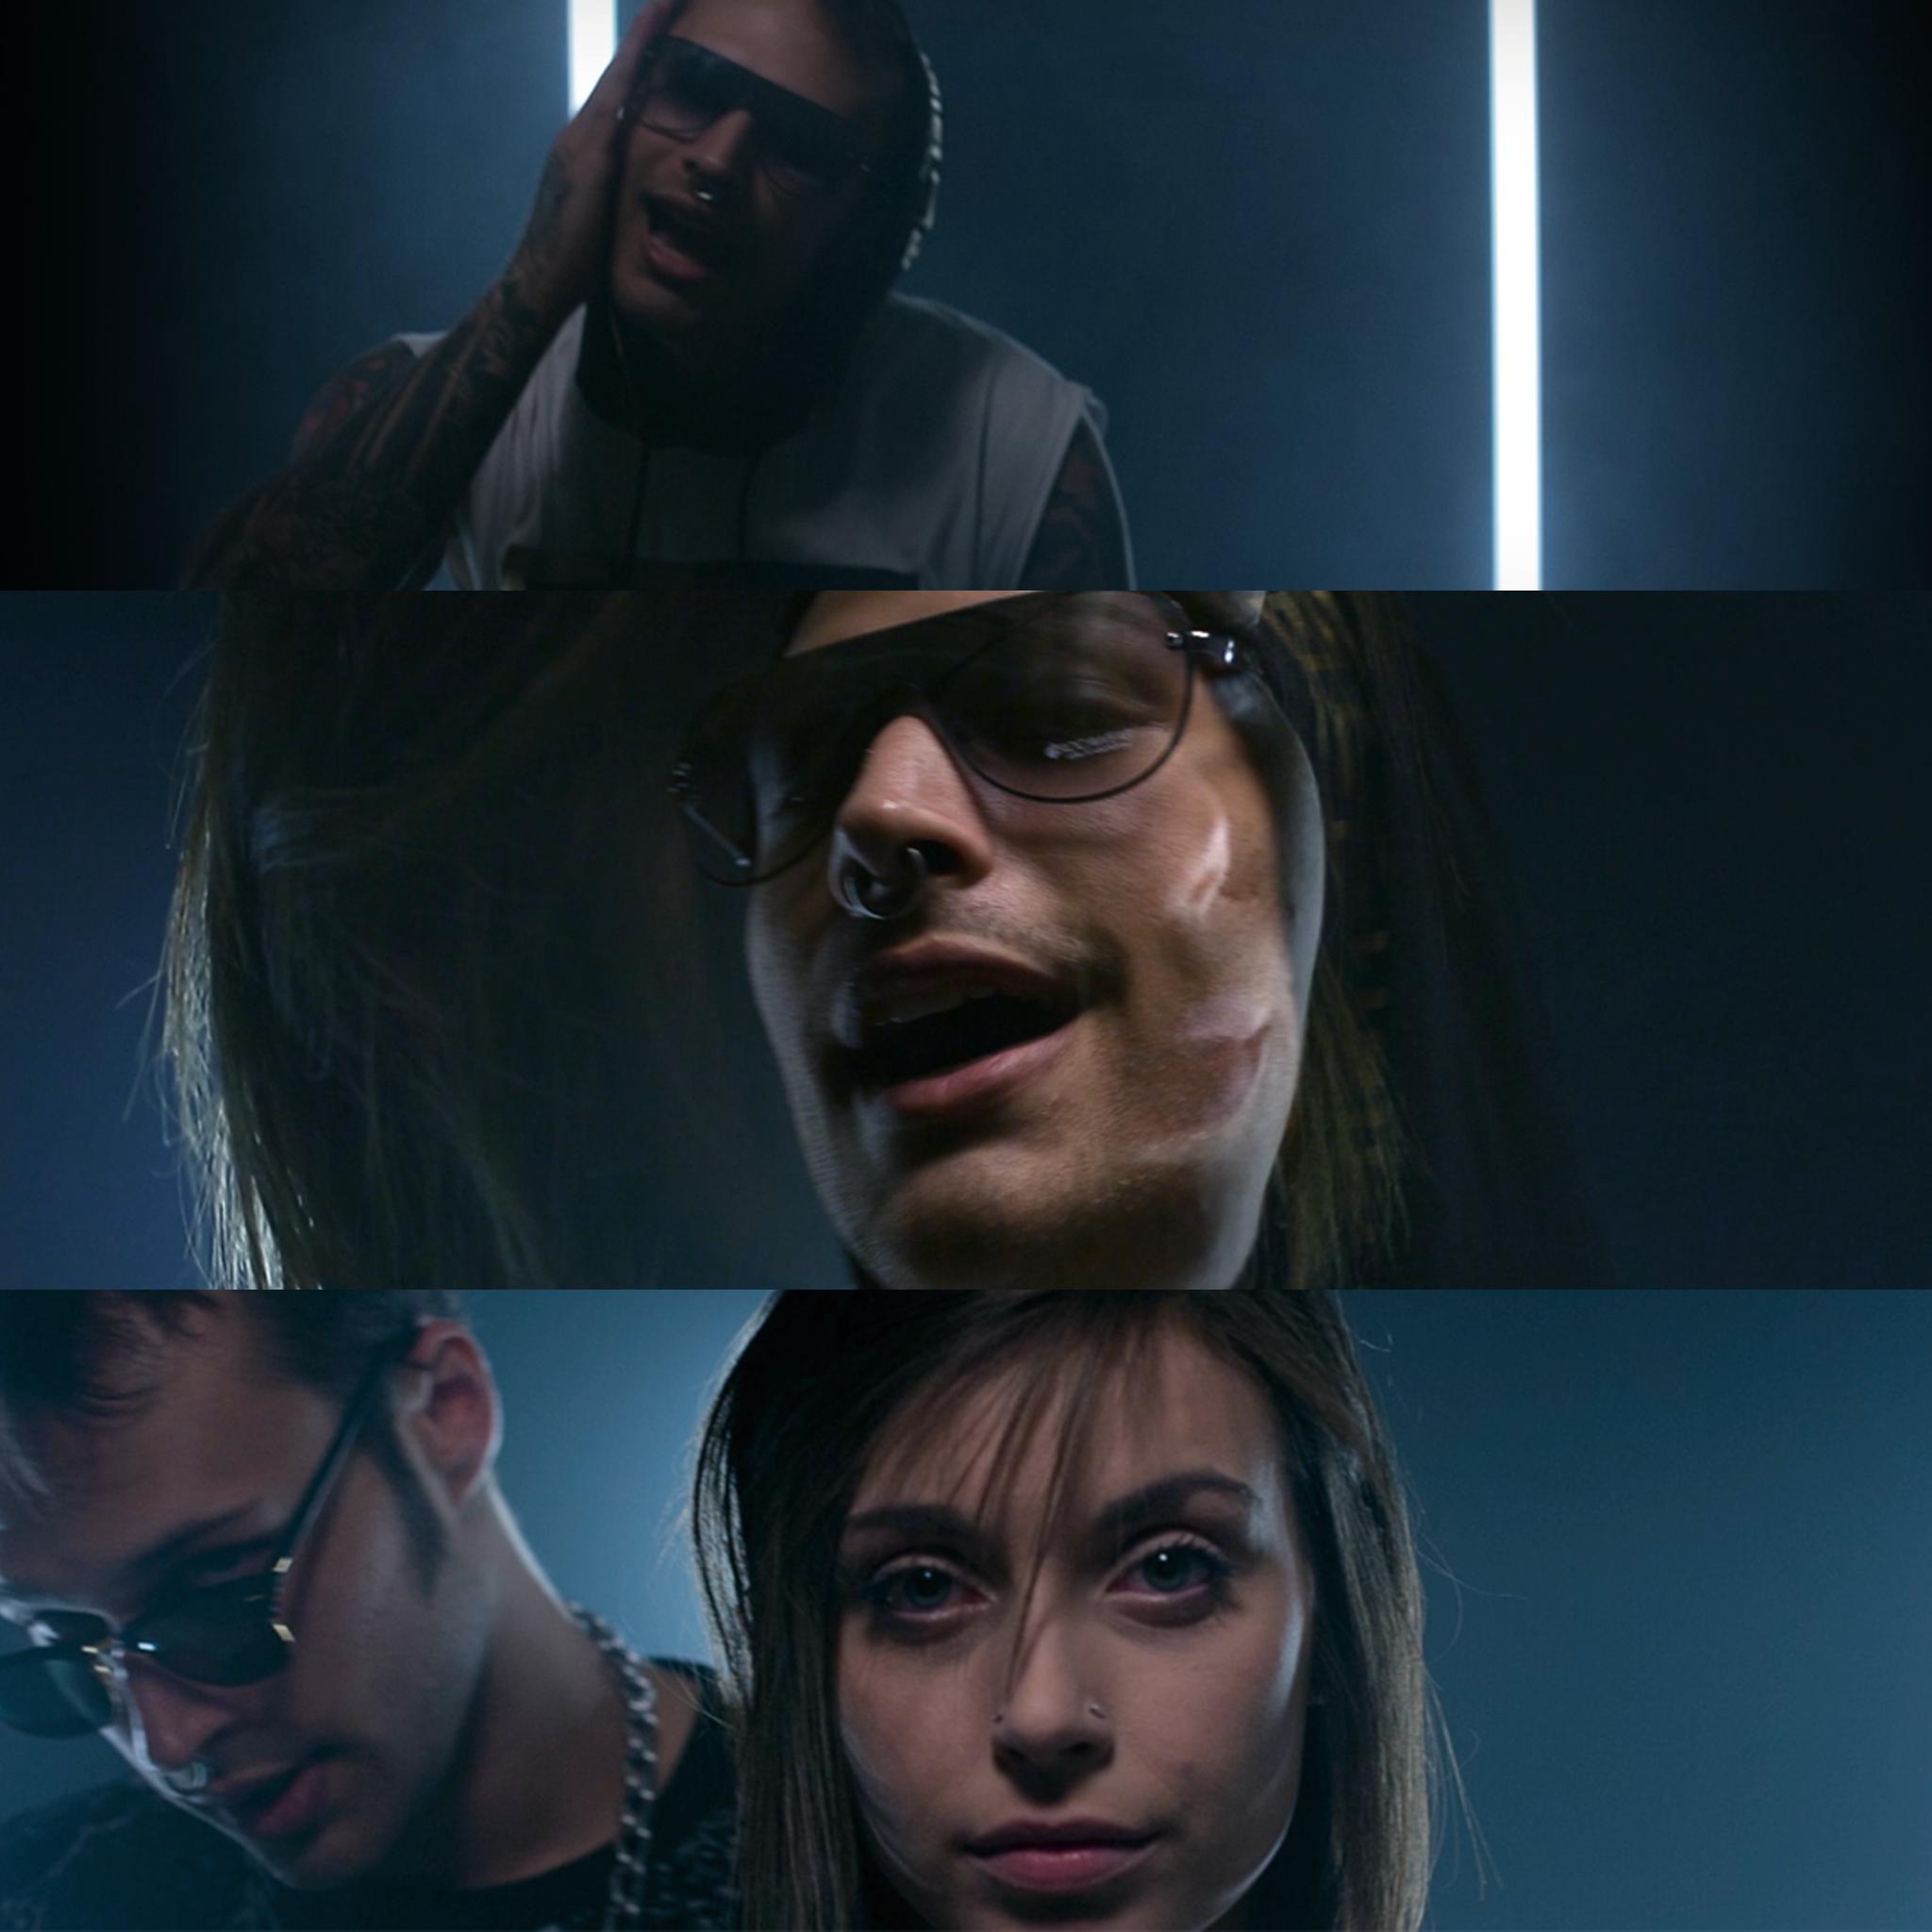 WXLFE Quasar Music Video Grxm Graveyard boyz